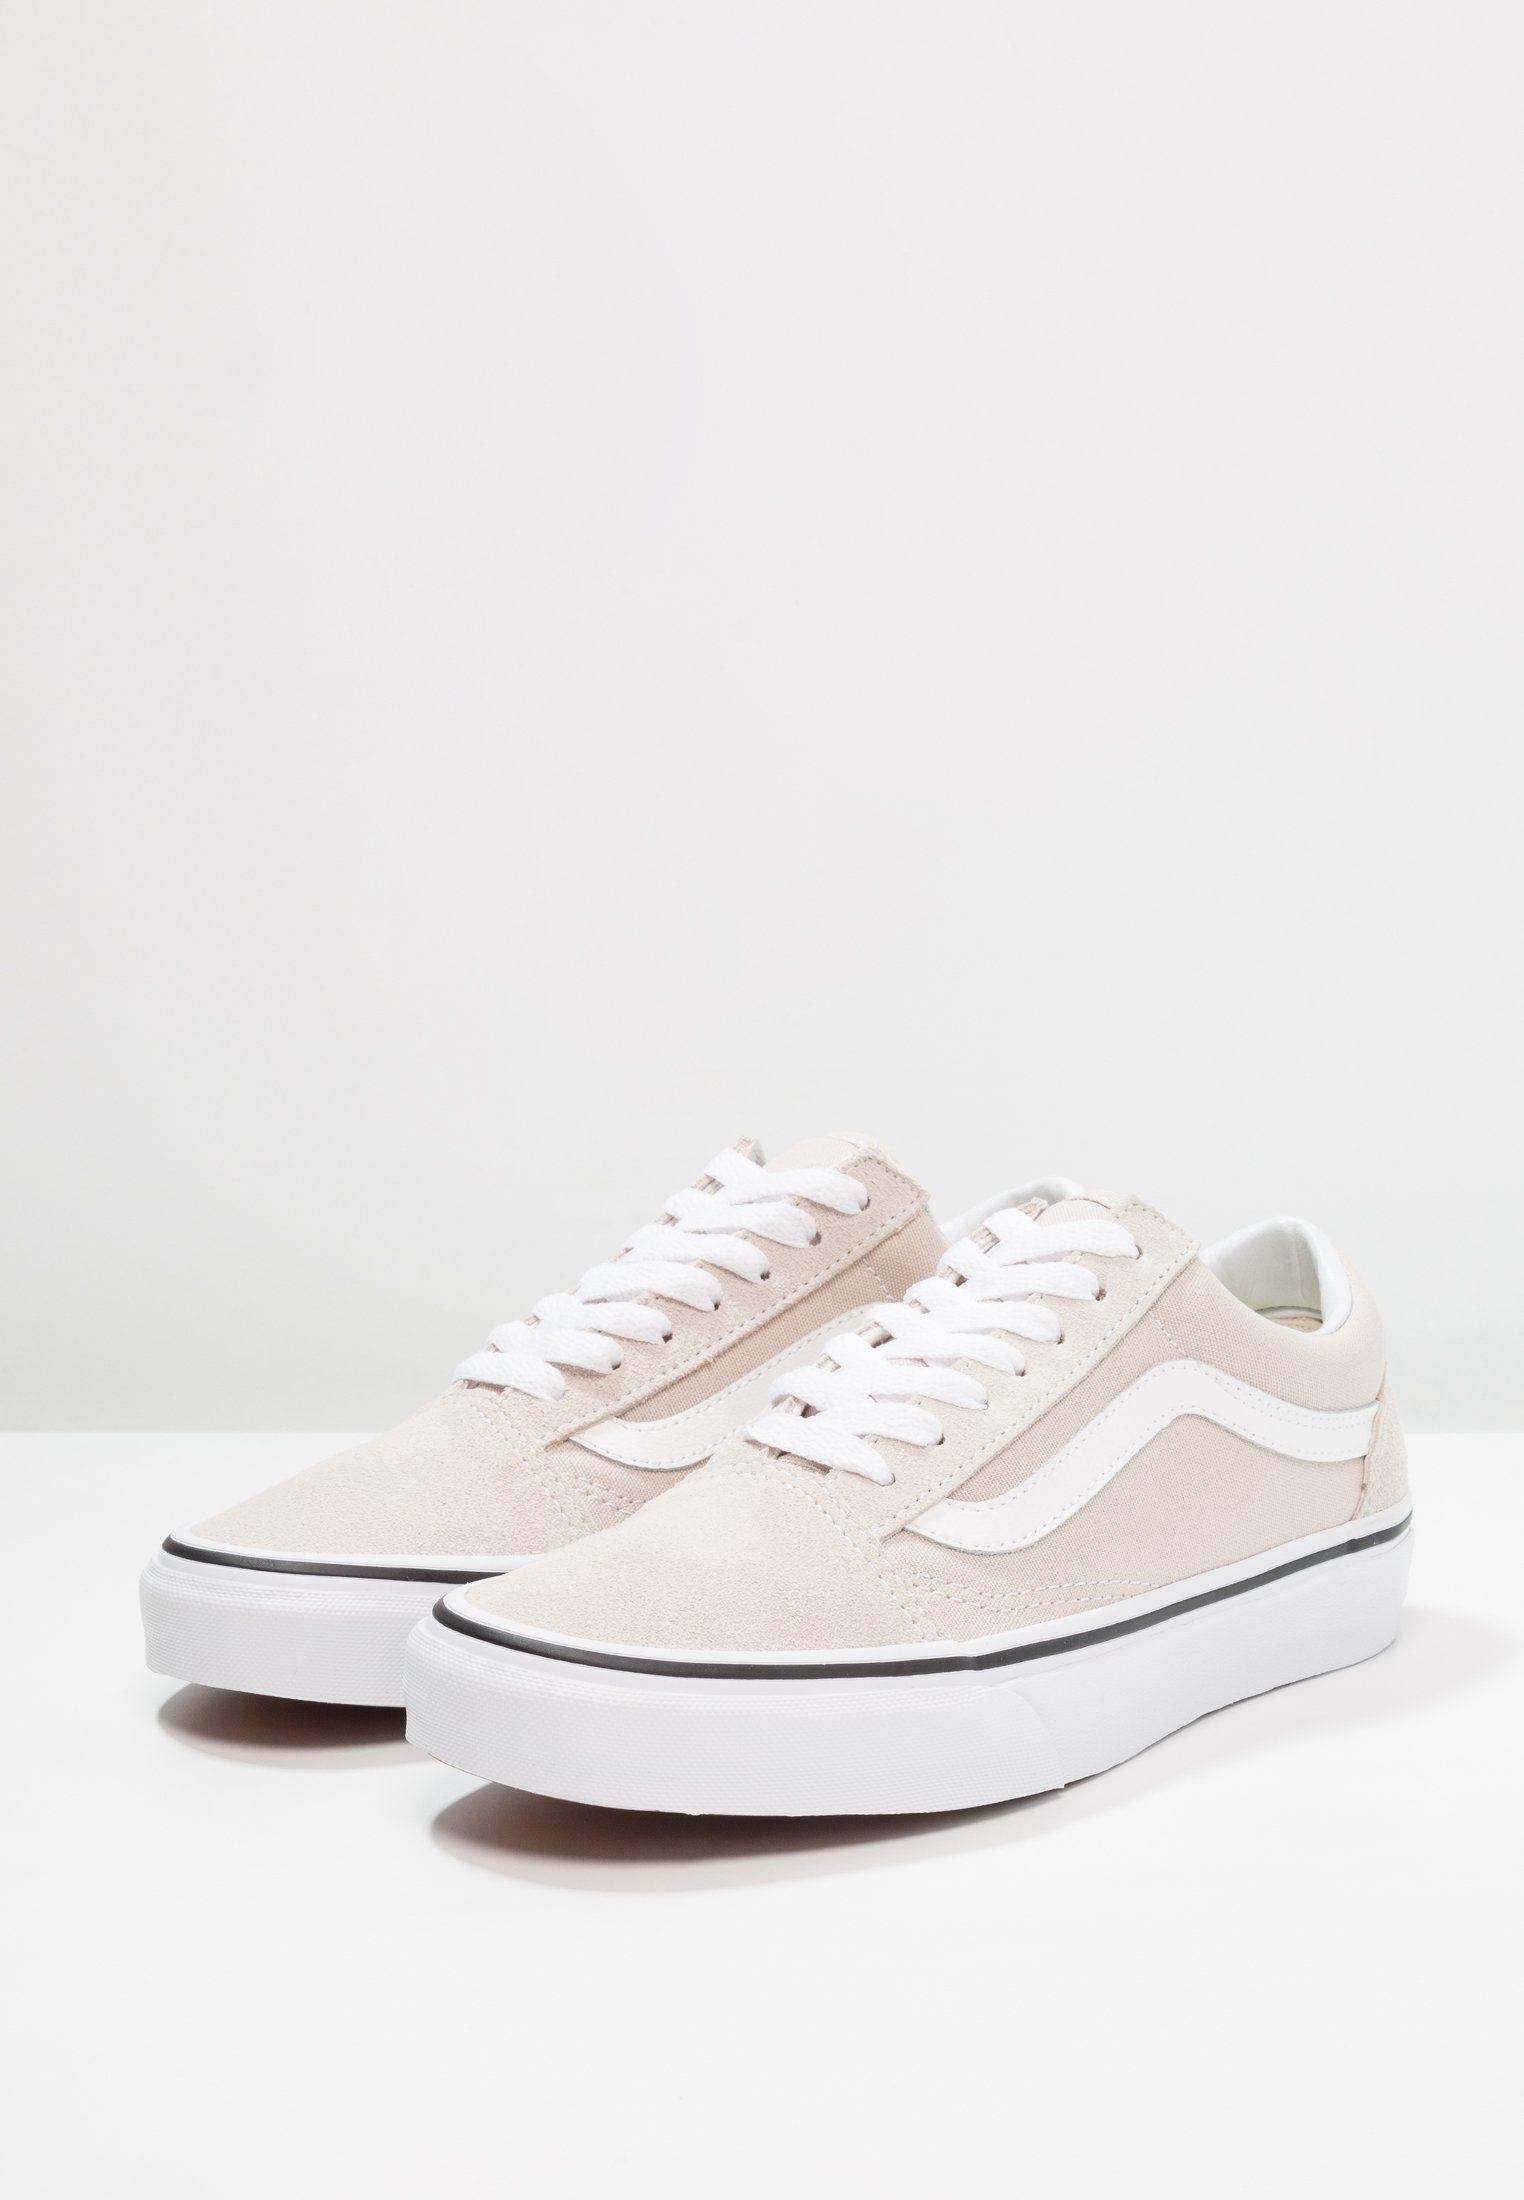 a0c55c4e67 Vans UA OLD SKOOL - Baskets basses - silver lining true white - ZALANDO.FR